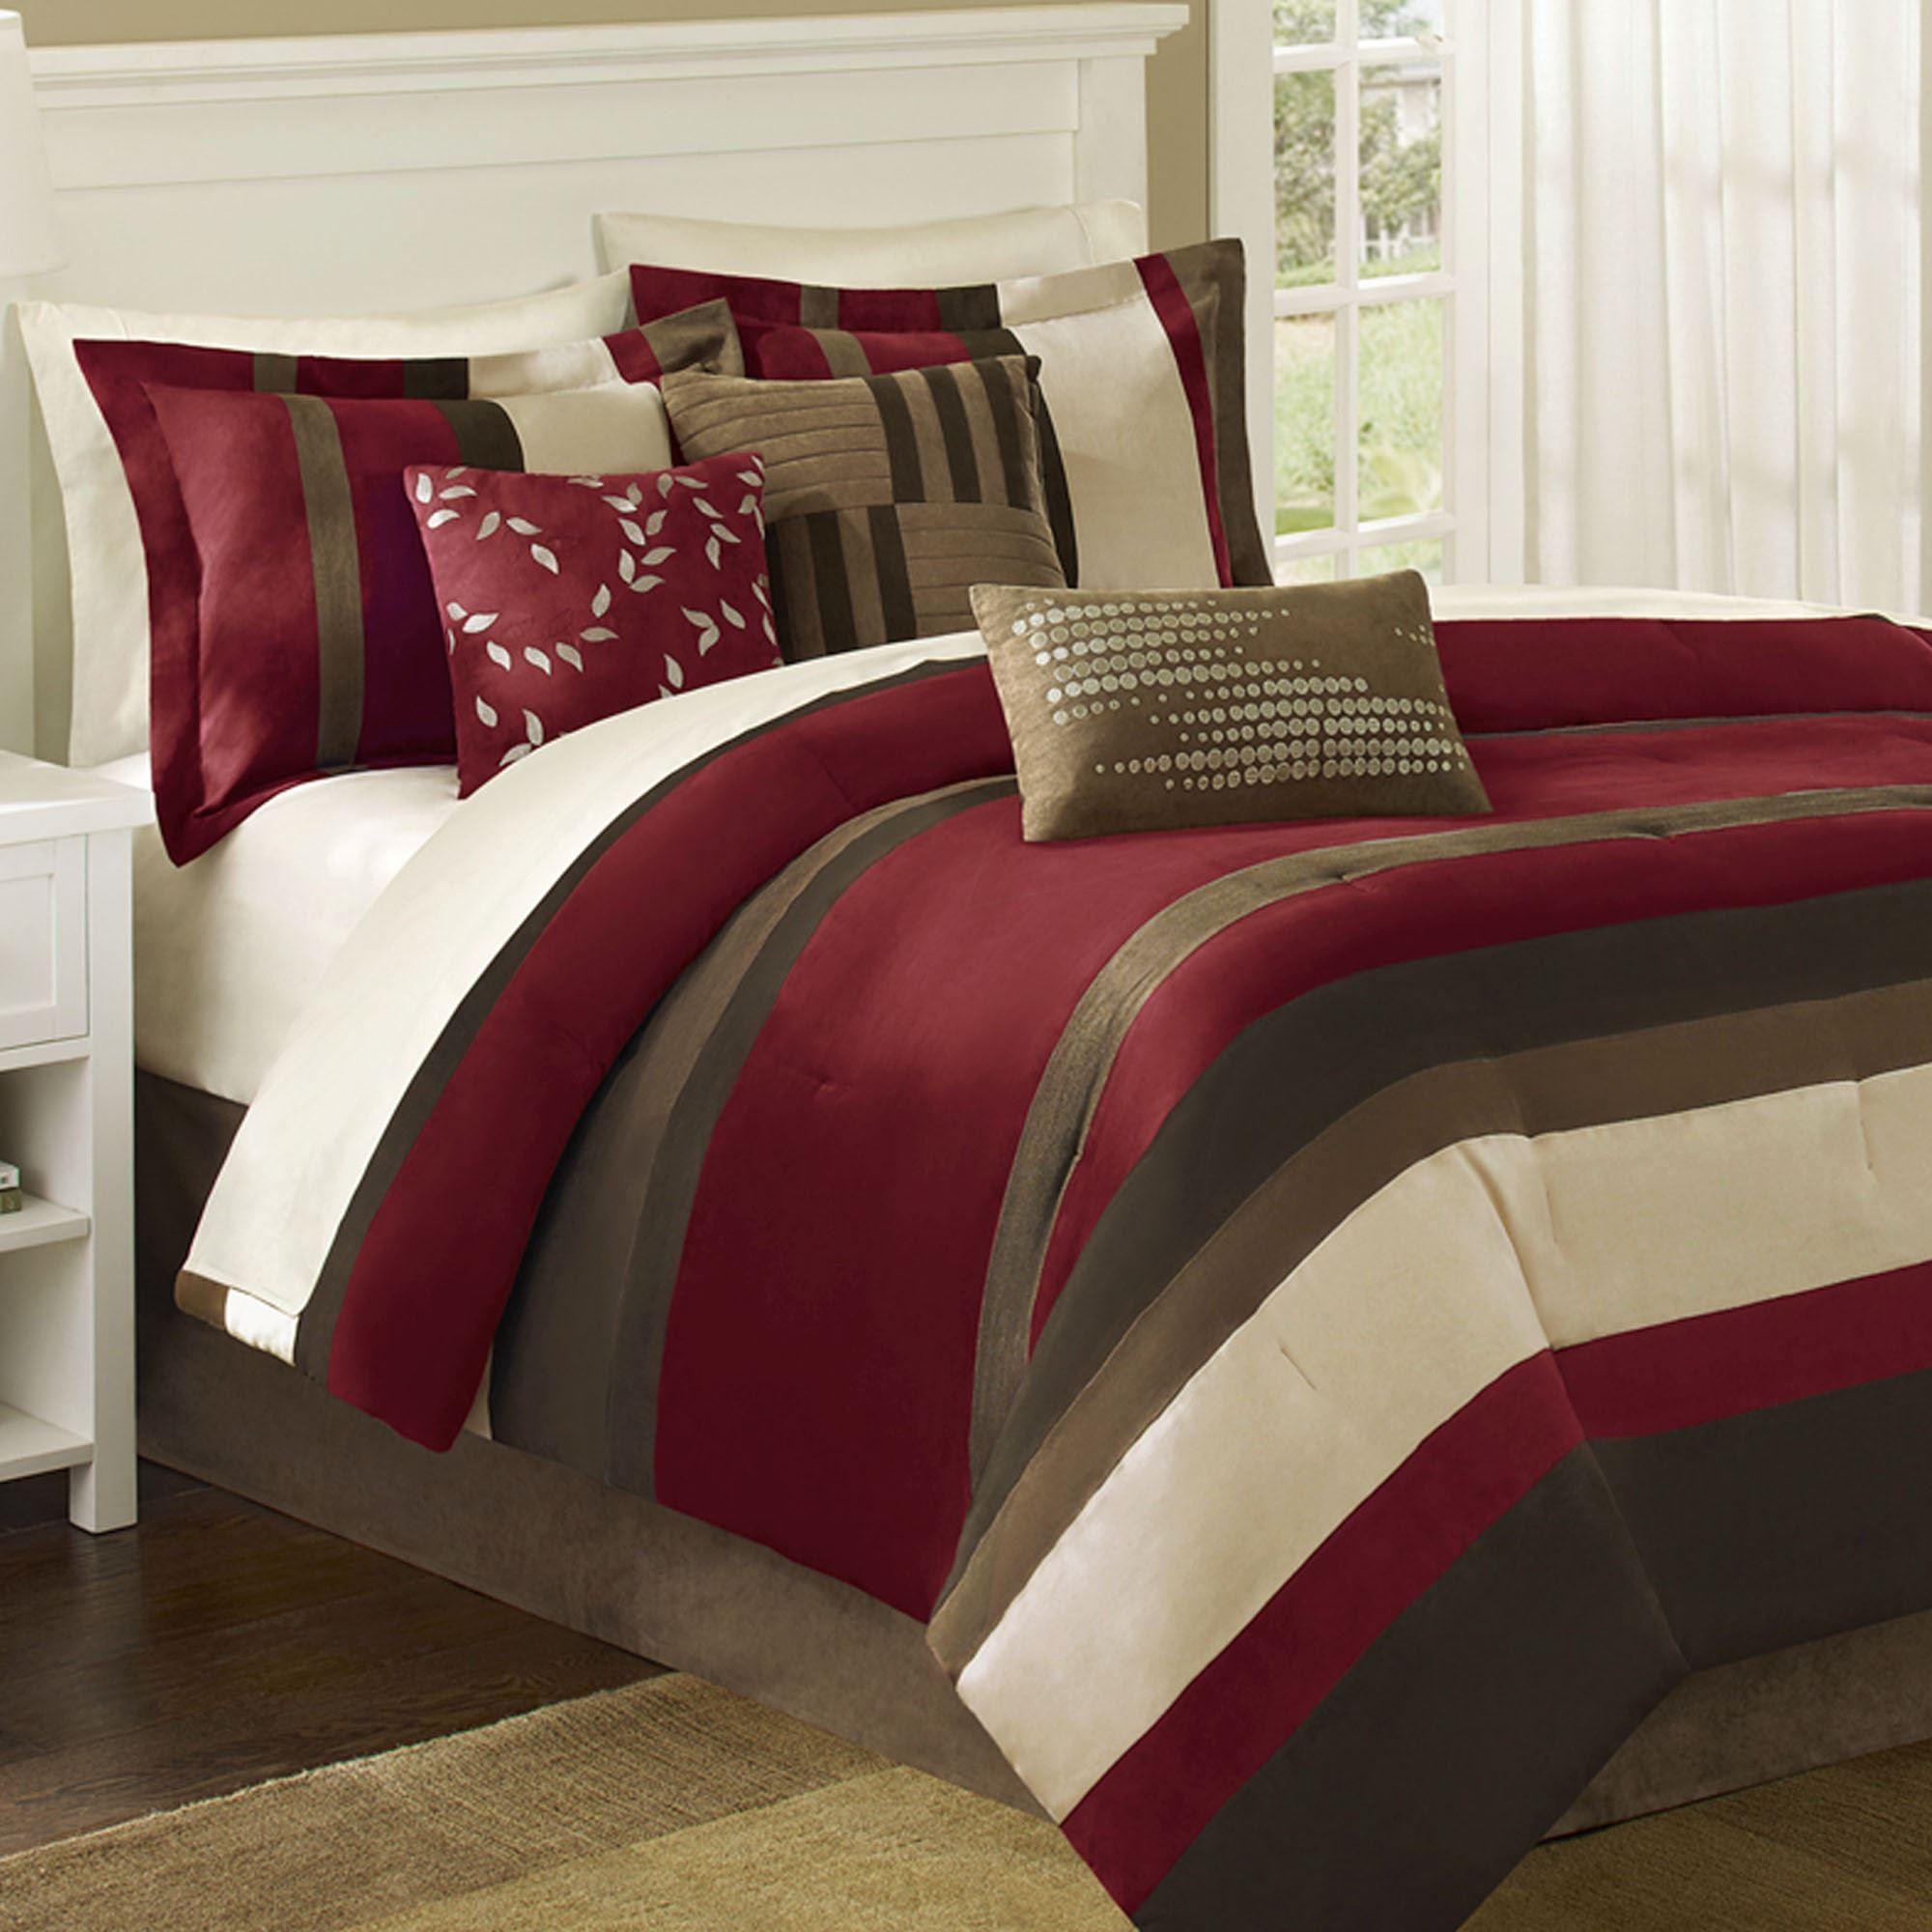 3 piece kitchen rug set moen single handle faucet boulder stripe 7 pc comforter bed